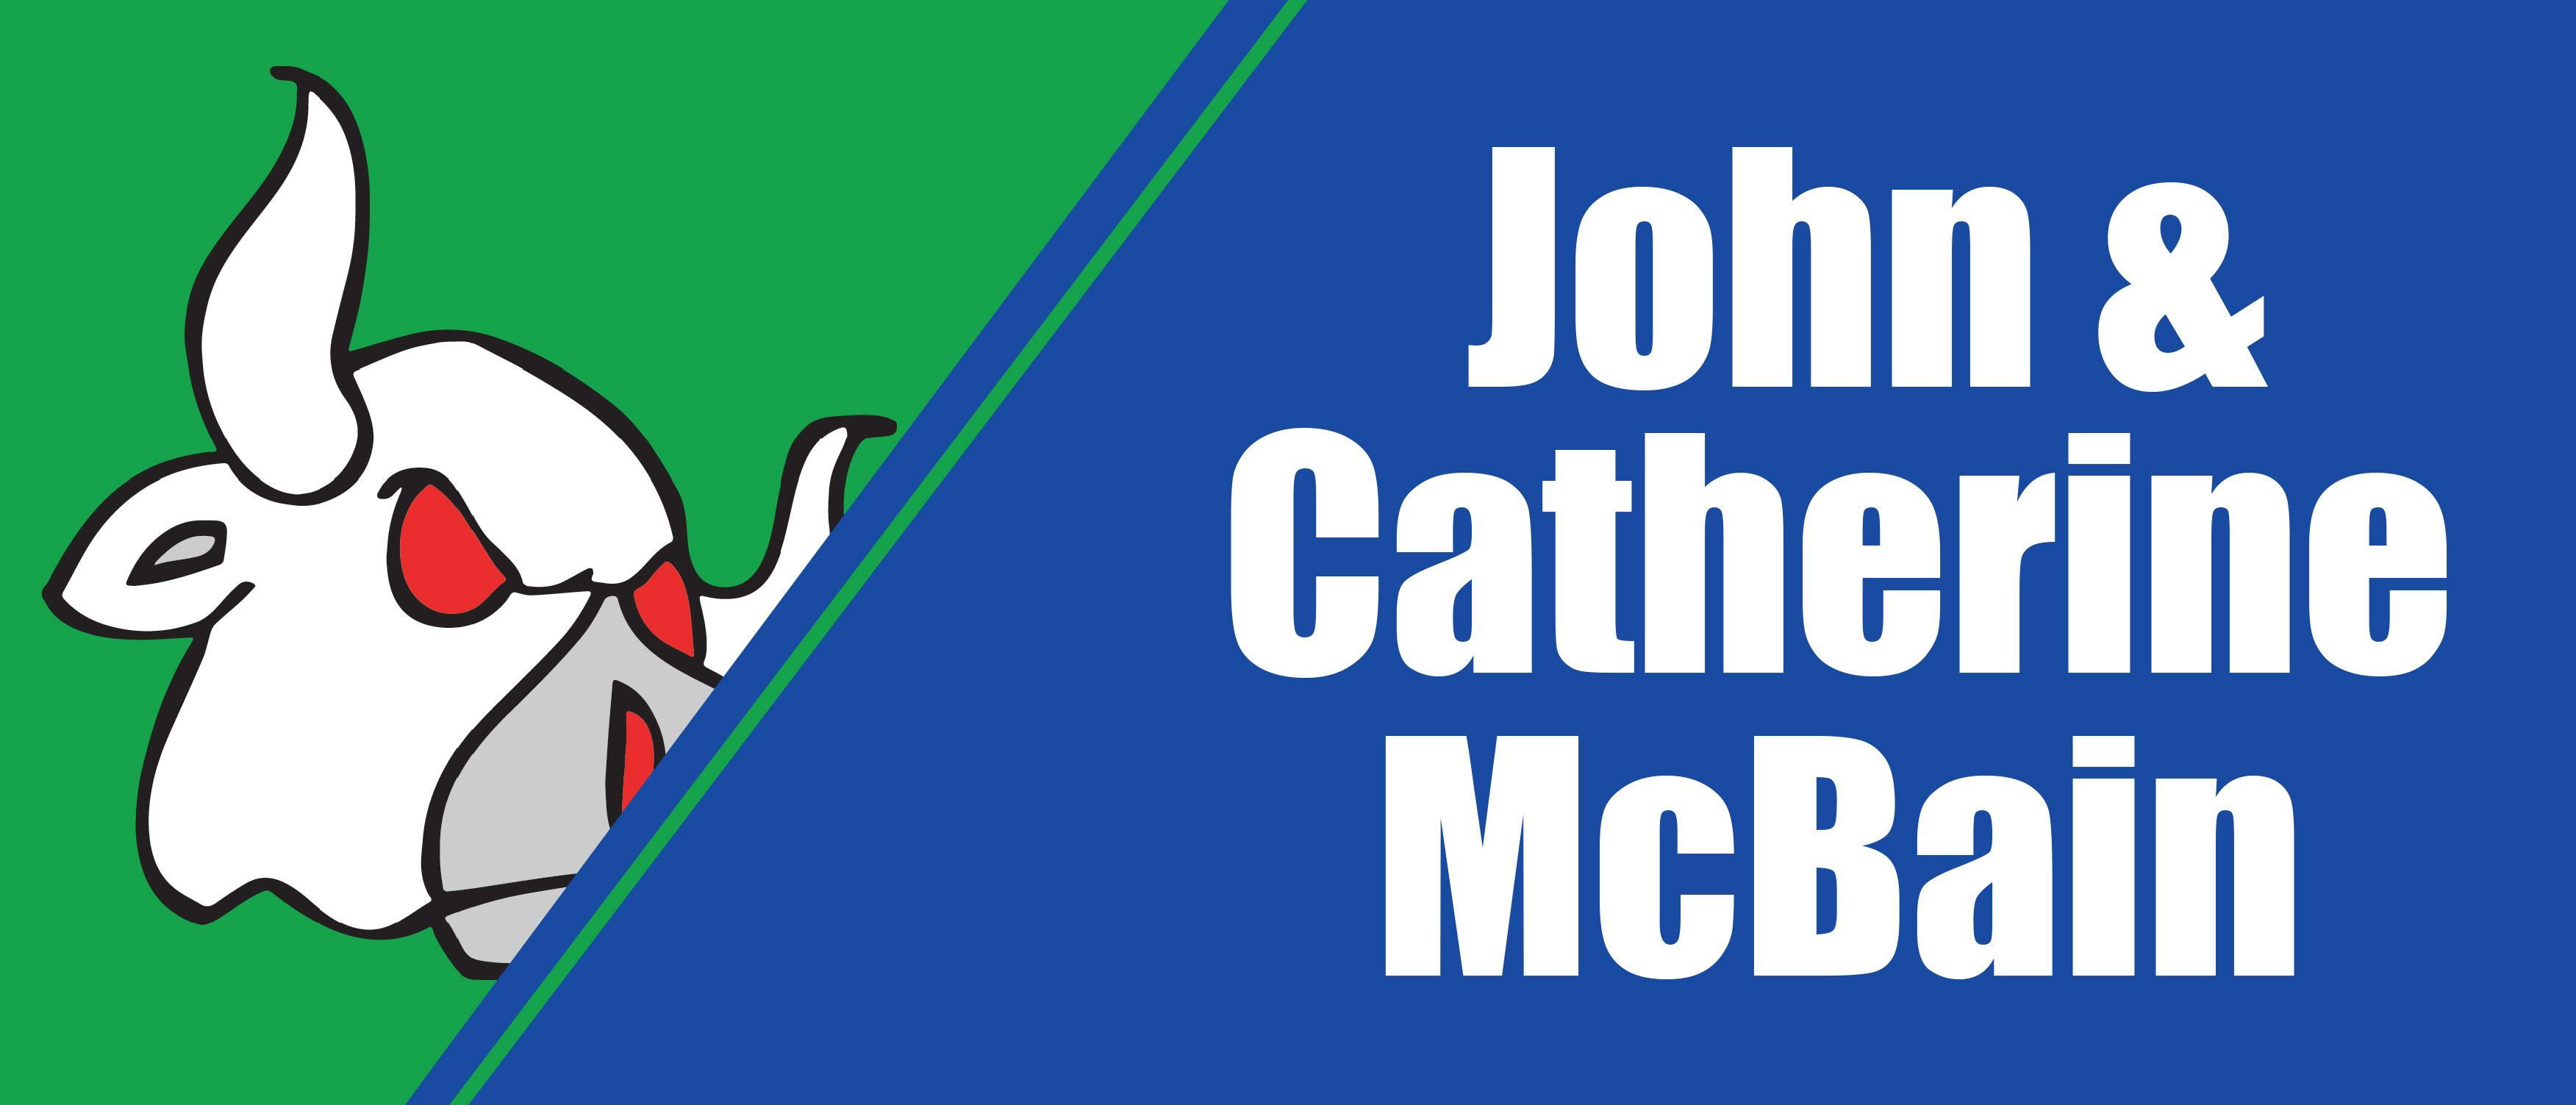 John & Catherine McBain